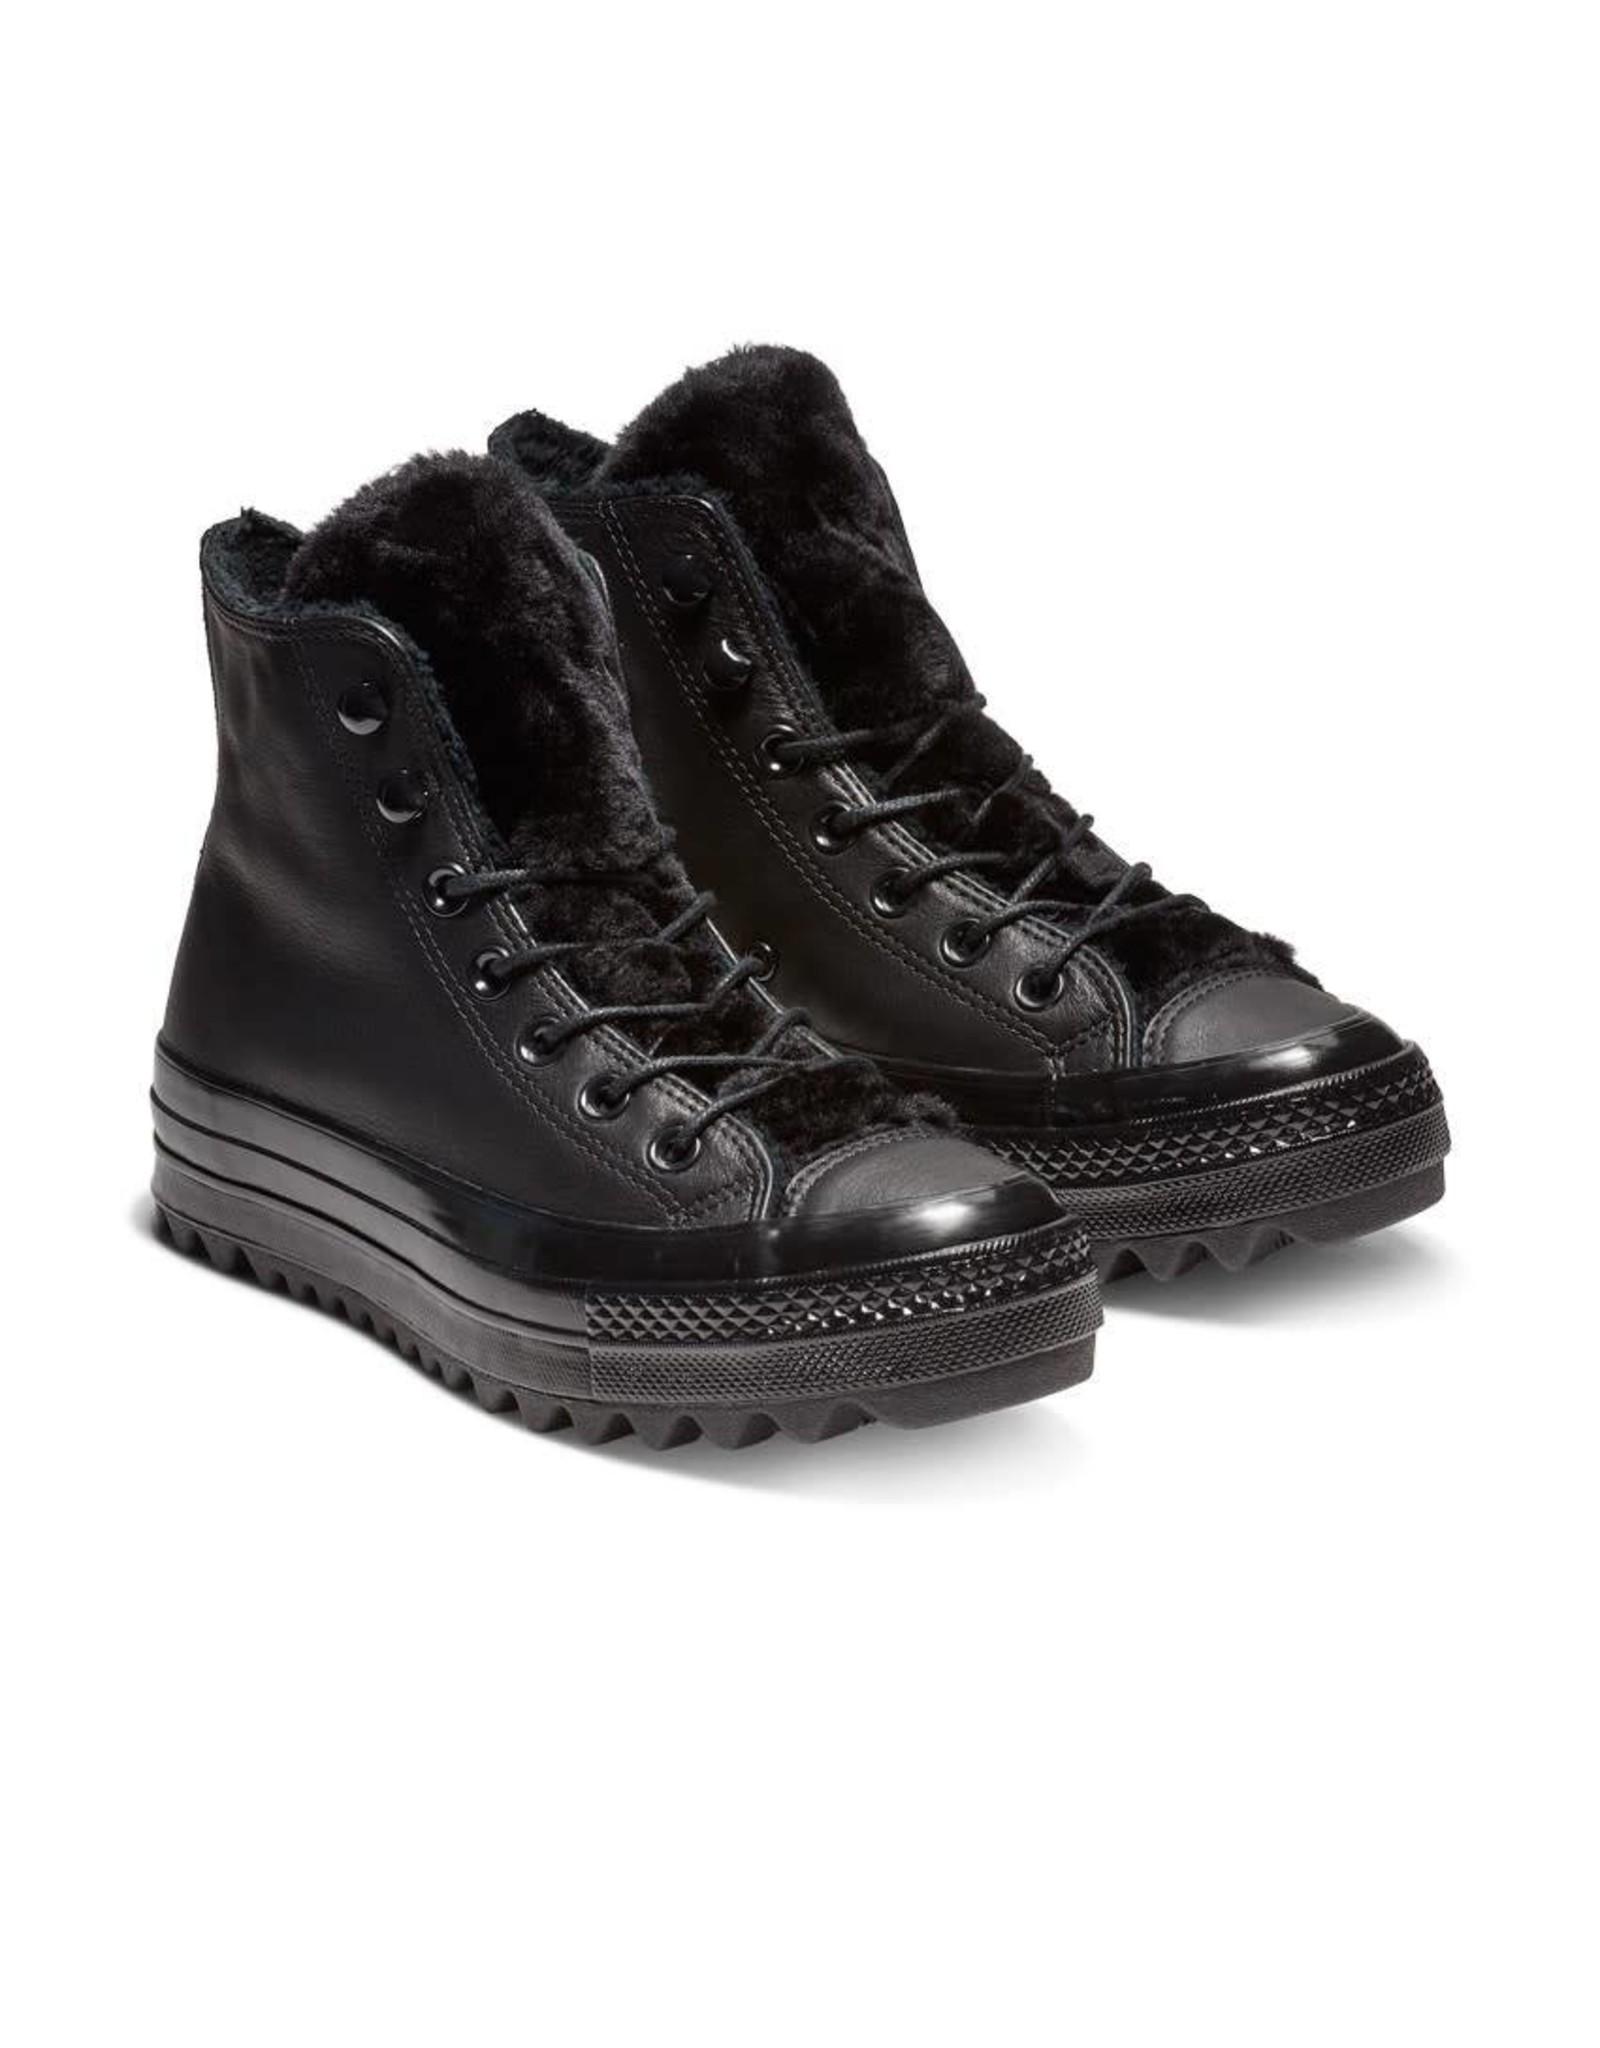 CONVERSE CHUCK TAYLOR LIFT RIPPLE HI CUIR BLACK/BLACK/BLACK C18LRB-562422C